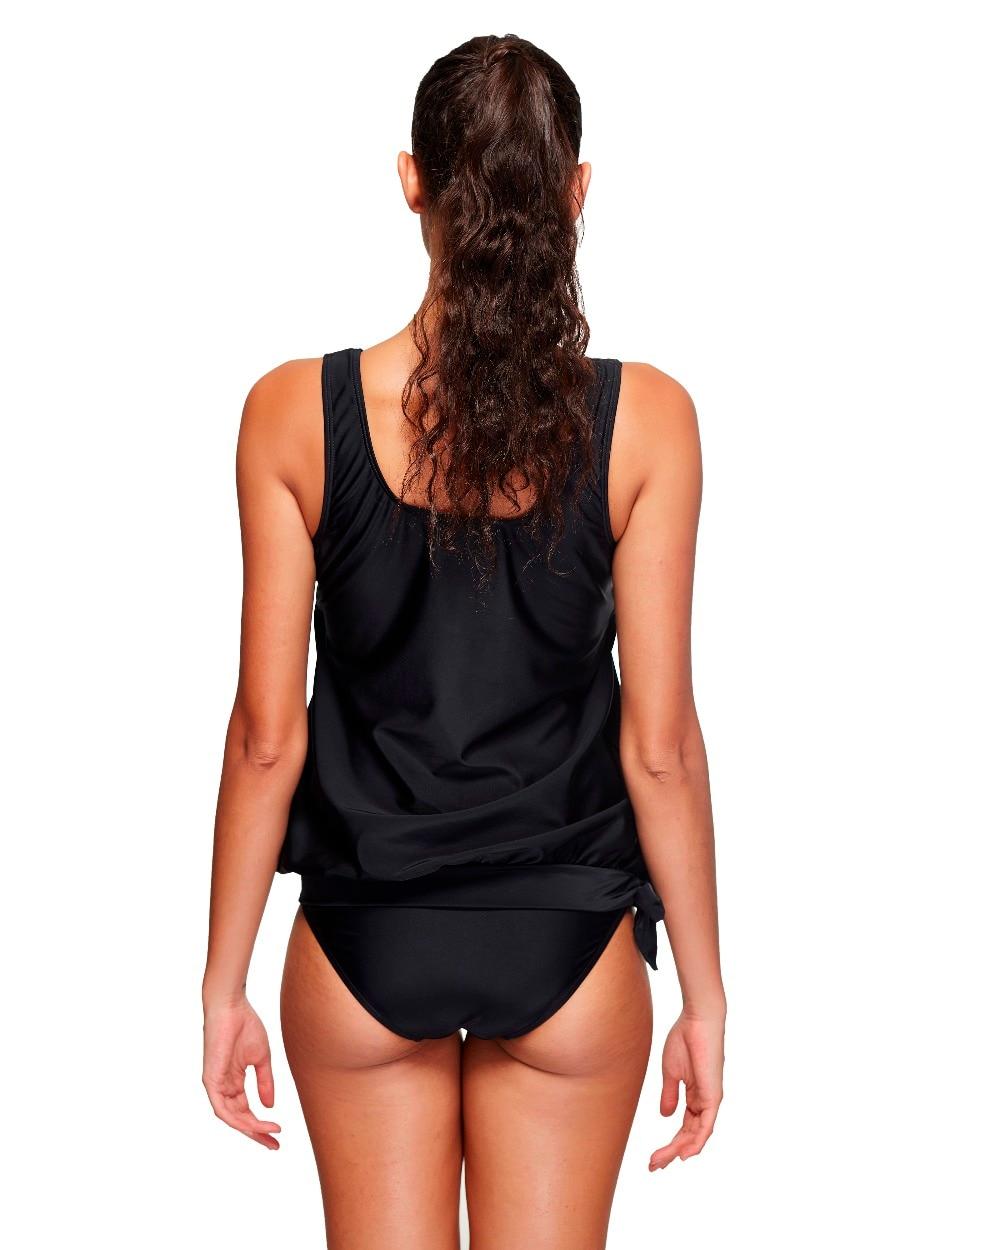 87c5152506d35 2 Piece women swimsuit tankini solid black woman bathing suit beach wear  tank top+bottom quick dry female plus size swimwear 3XL-in Two-Piece Suits  from ...